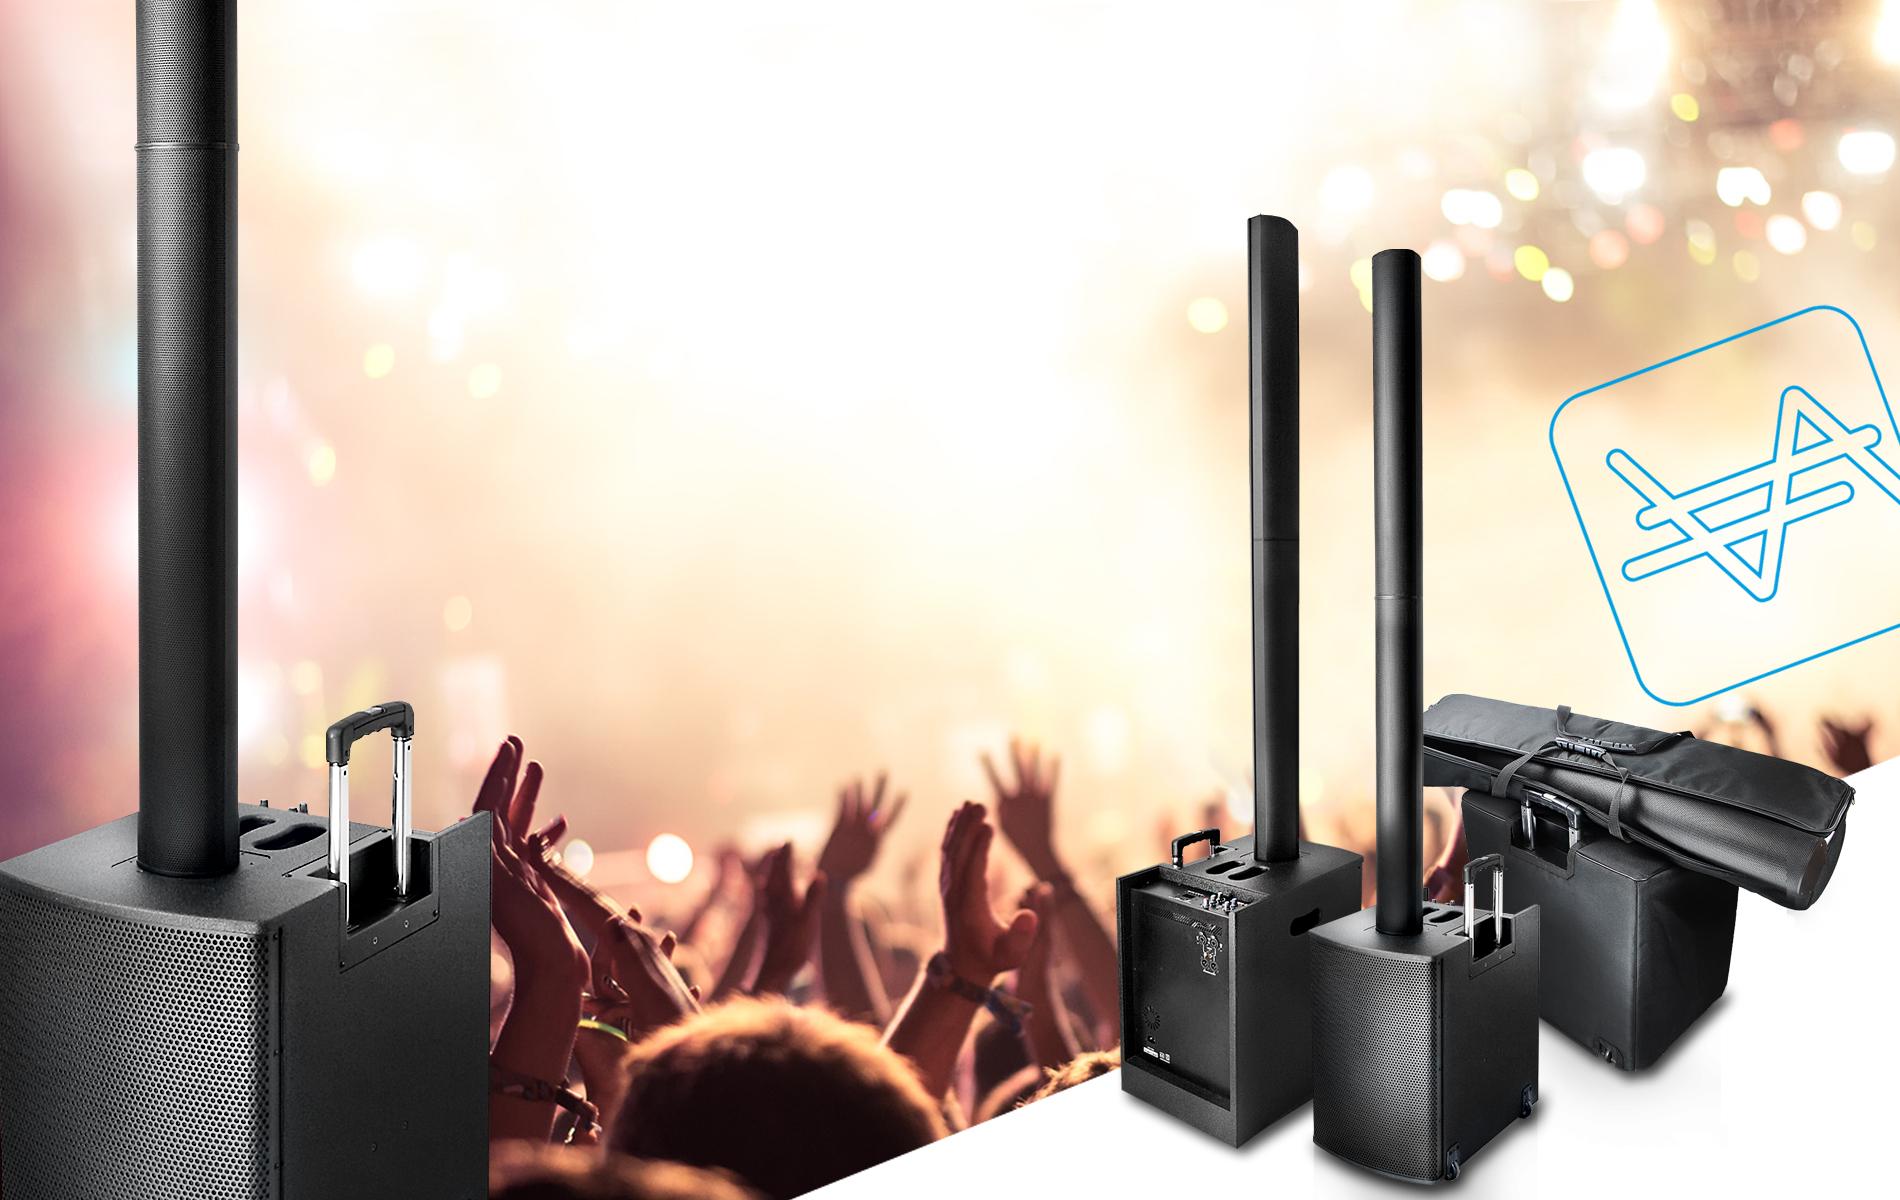 phoenix-audio-beam-steering-pv-live-lautsprechersystem-mobile-beschallung-elektronische-schallsteuerung-1